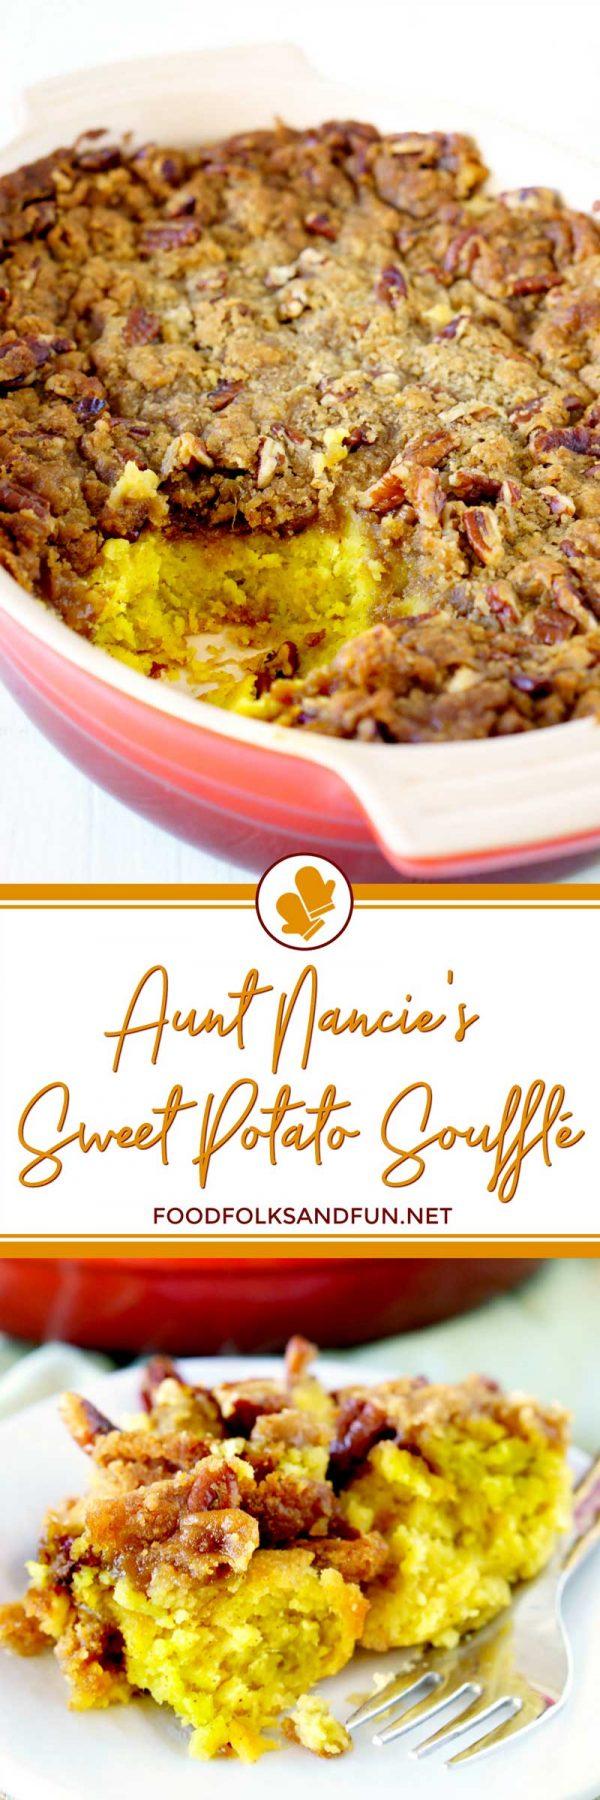 Sweet Potato Soufflé with Pecan Praline Topping